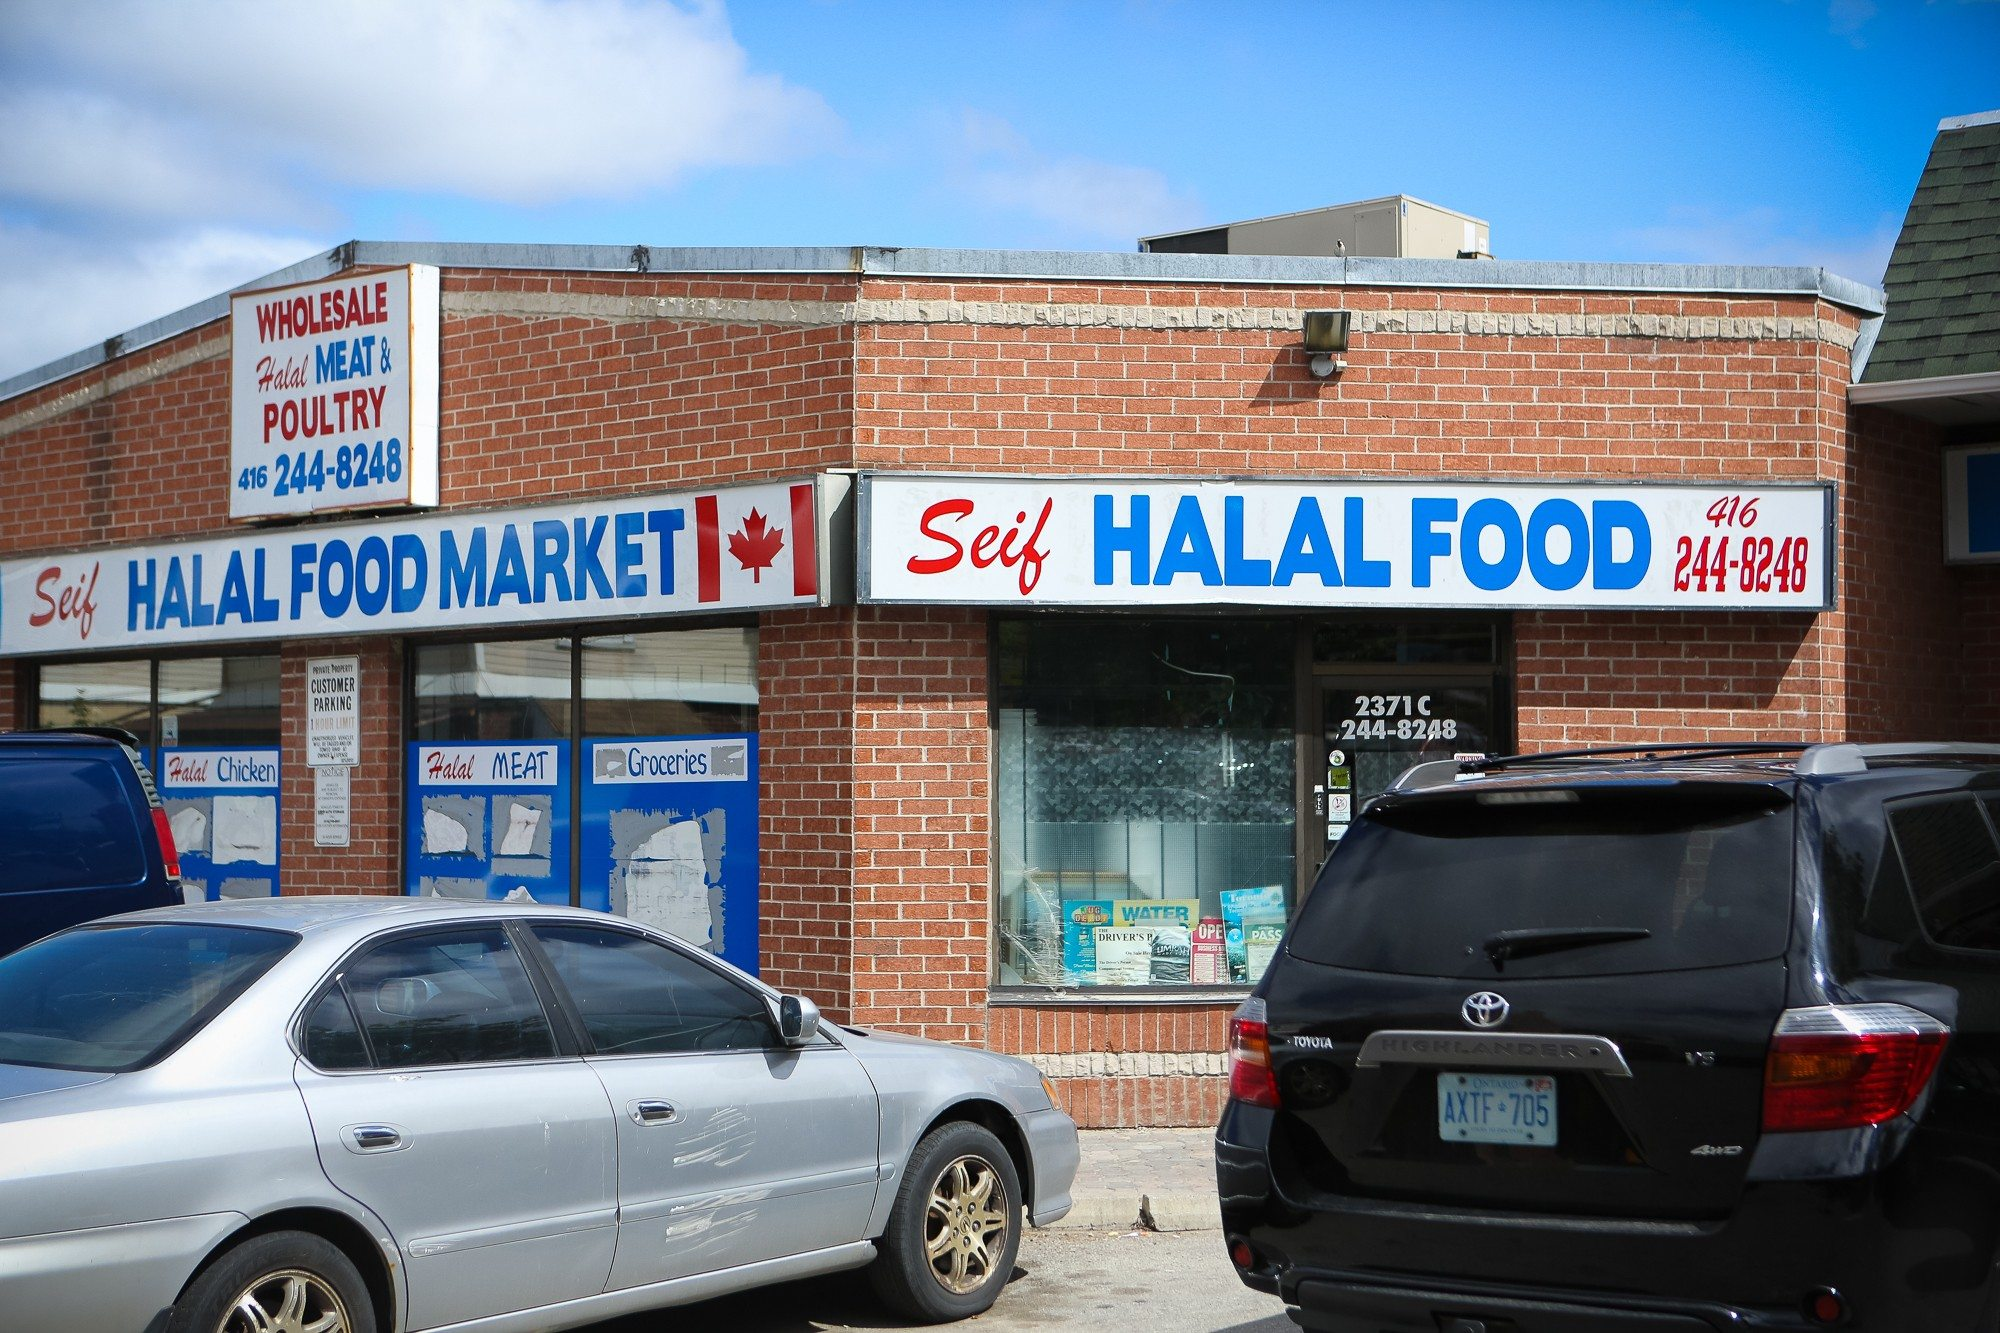 toronto-restaurants-chefs-in-the-burbs-bashir-munye-somali-rexdale-seif-halal-food-exterior